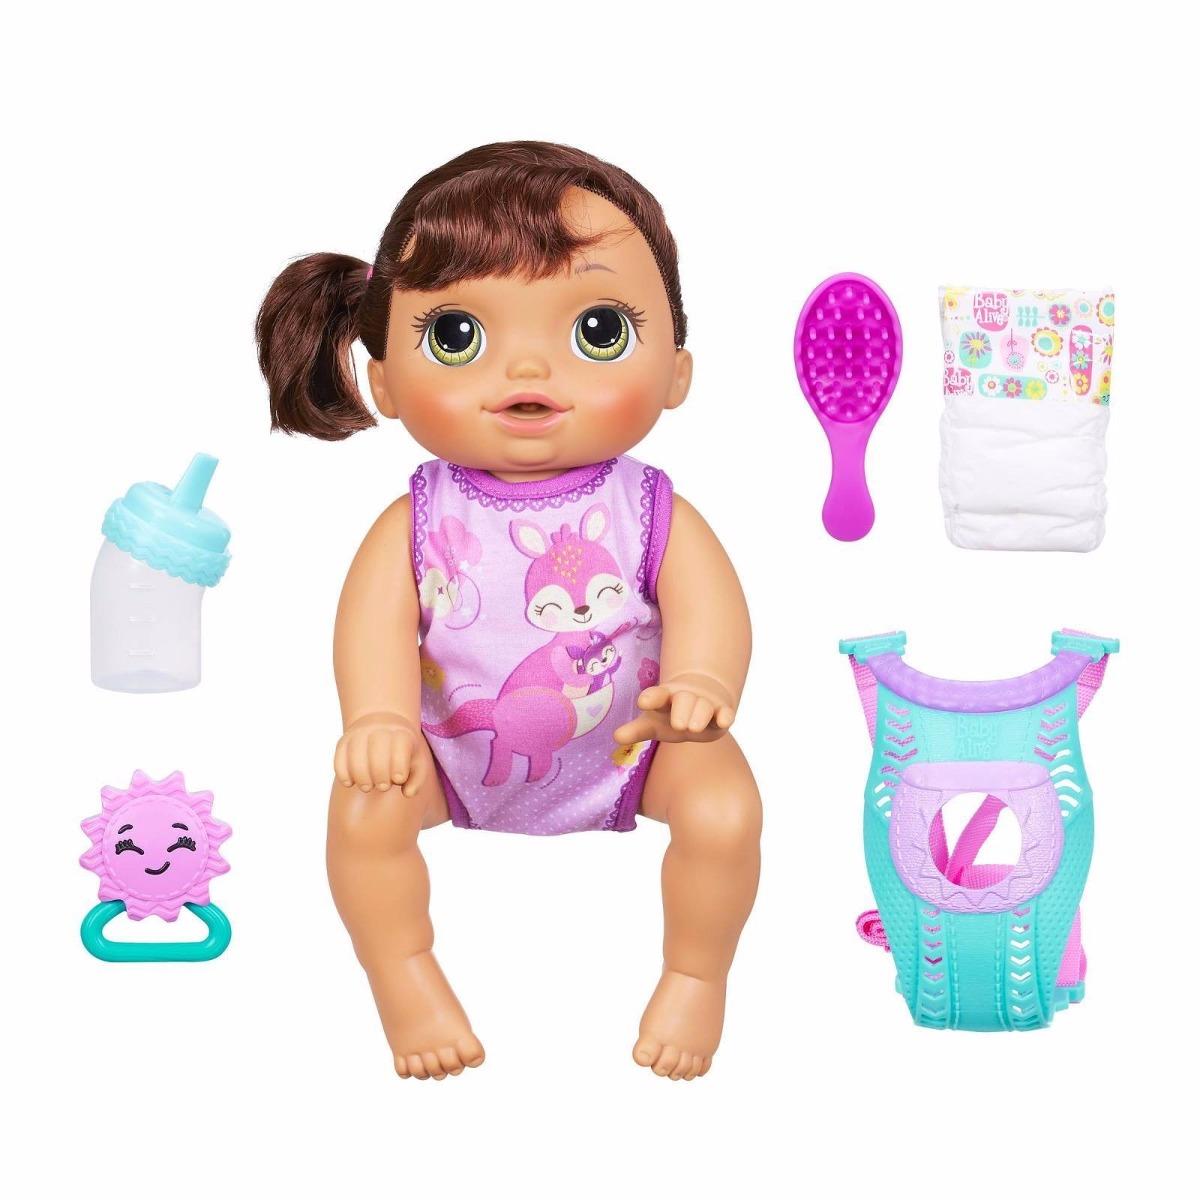 cce7f8434f Baby Alive Vamos Passear Morena Hasbro Hora Do Passeio - R  1.099